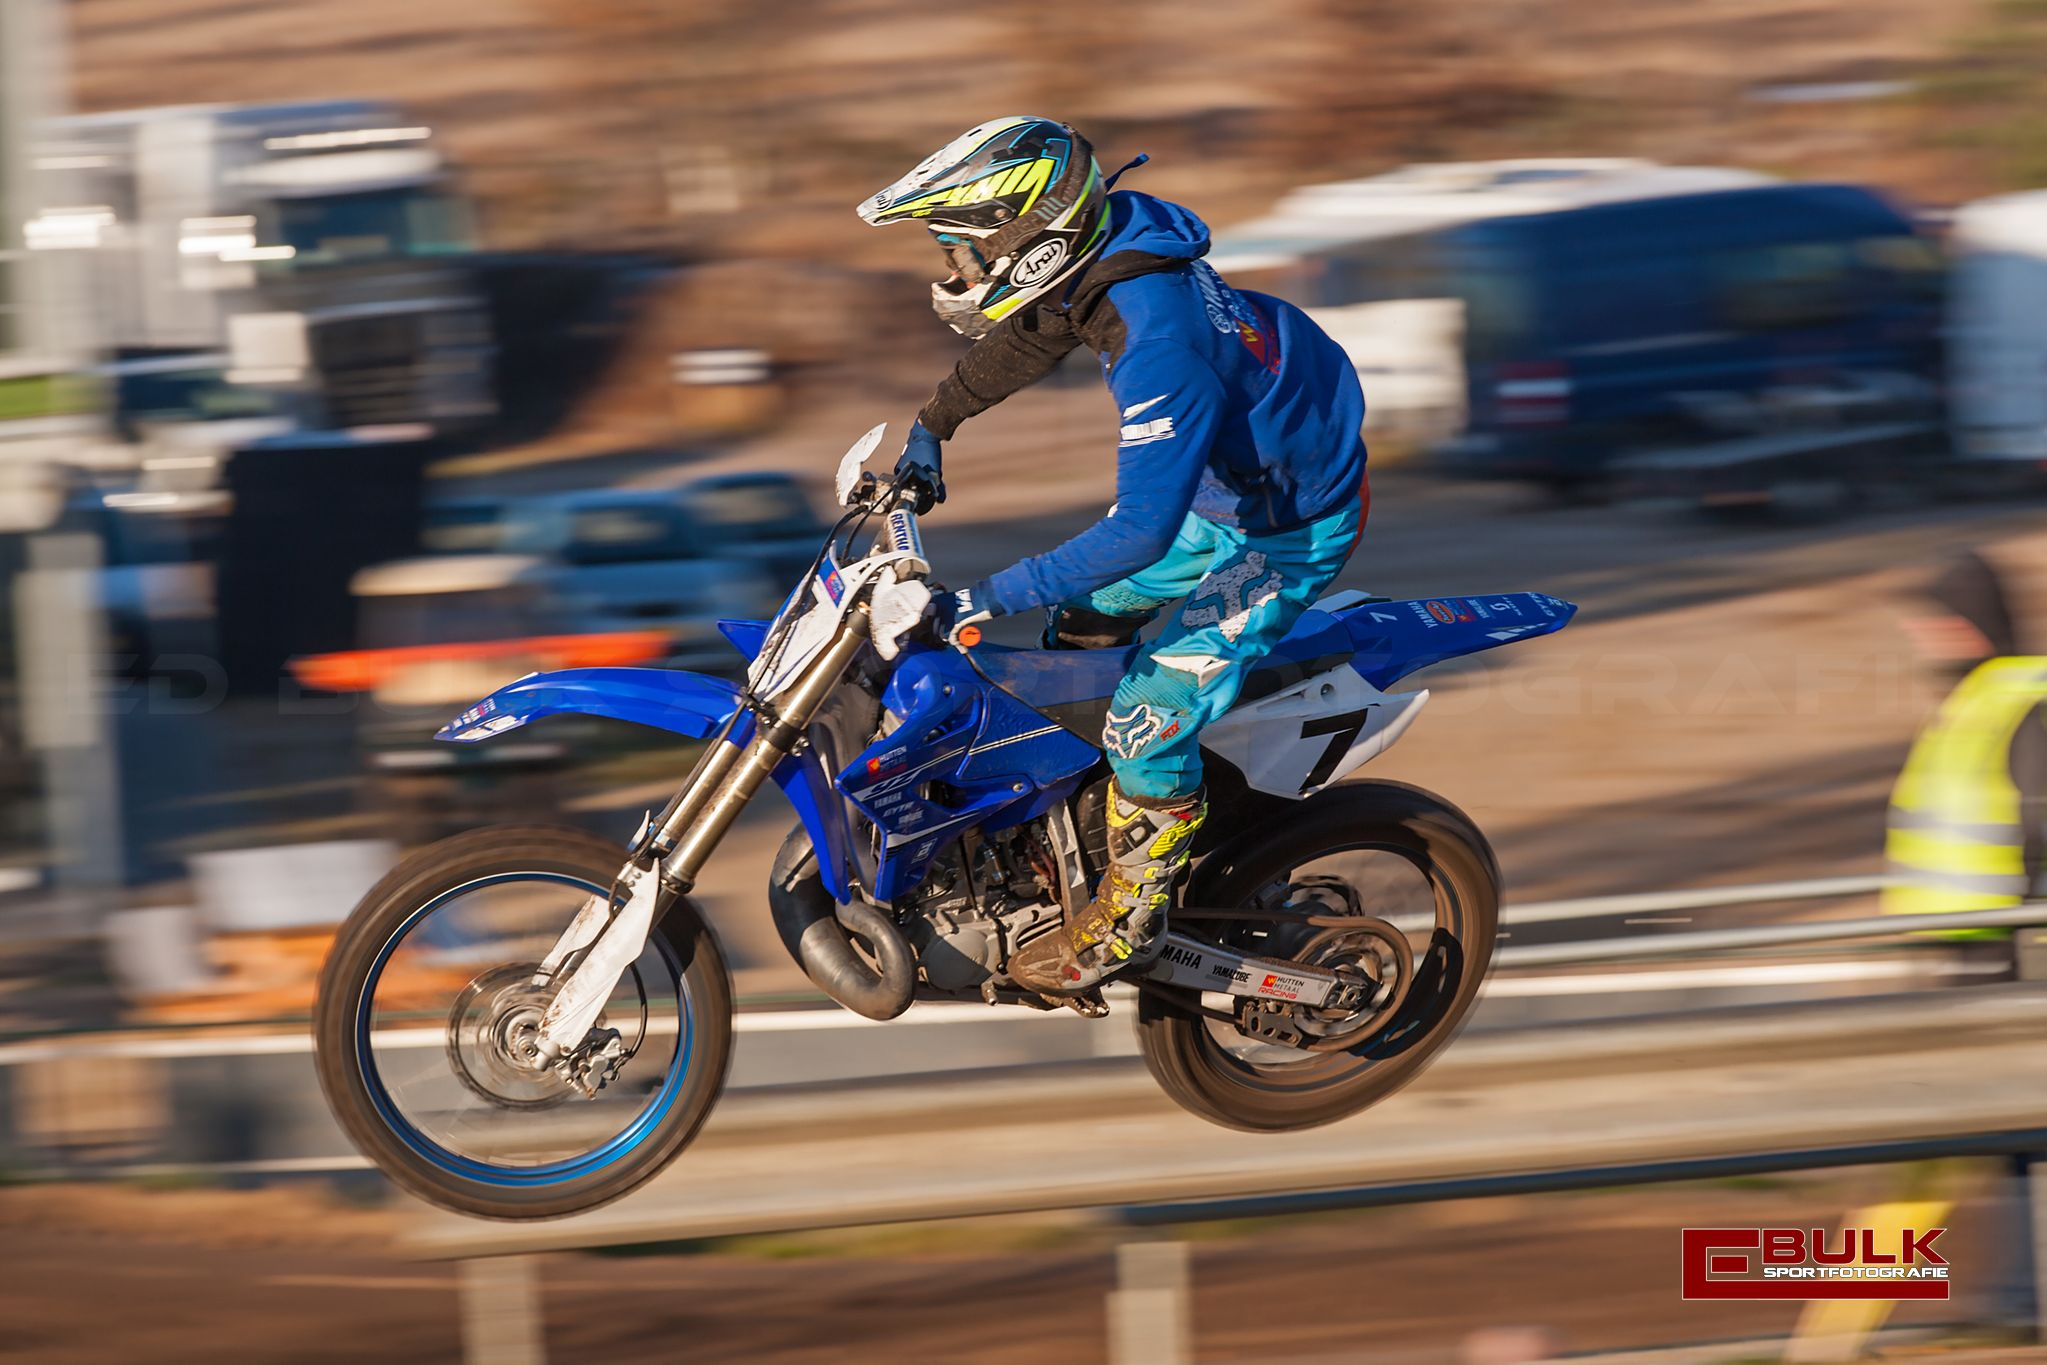 ebs_0059-ed_bulk_sportfotografie